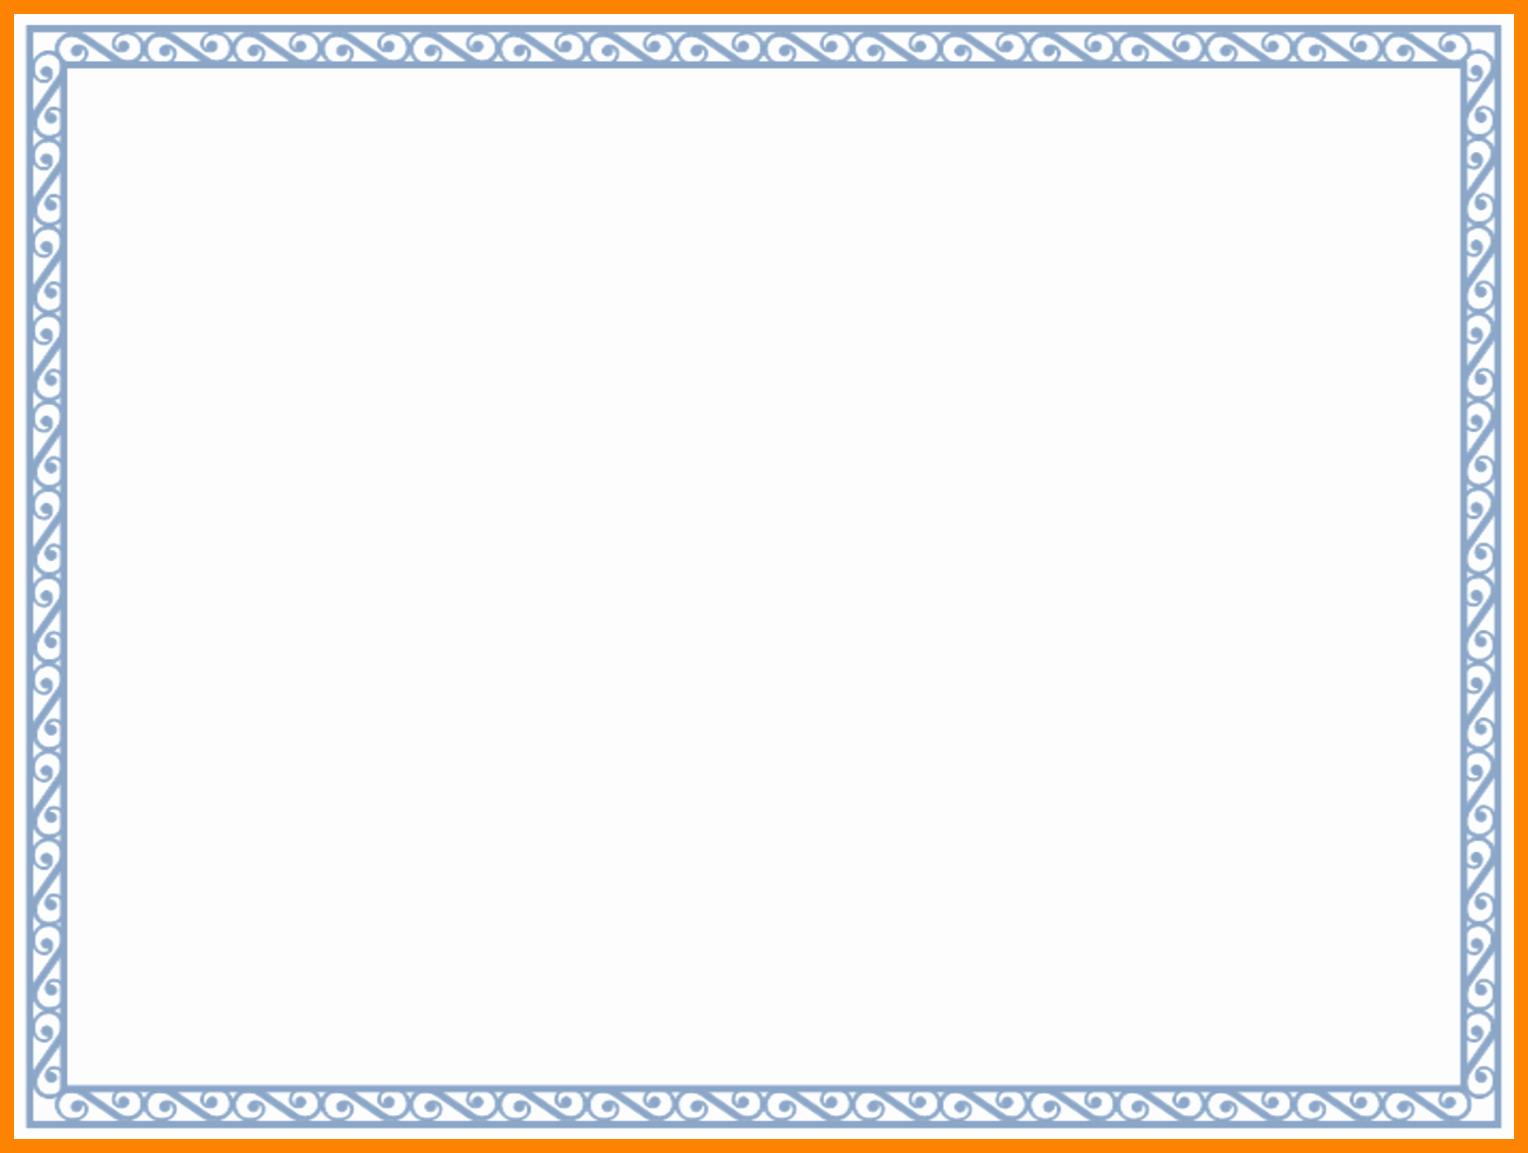 Free Printable Blank Certificate Borders Lovely Border Templates for Certificatesee Certificate Border